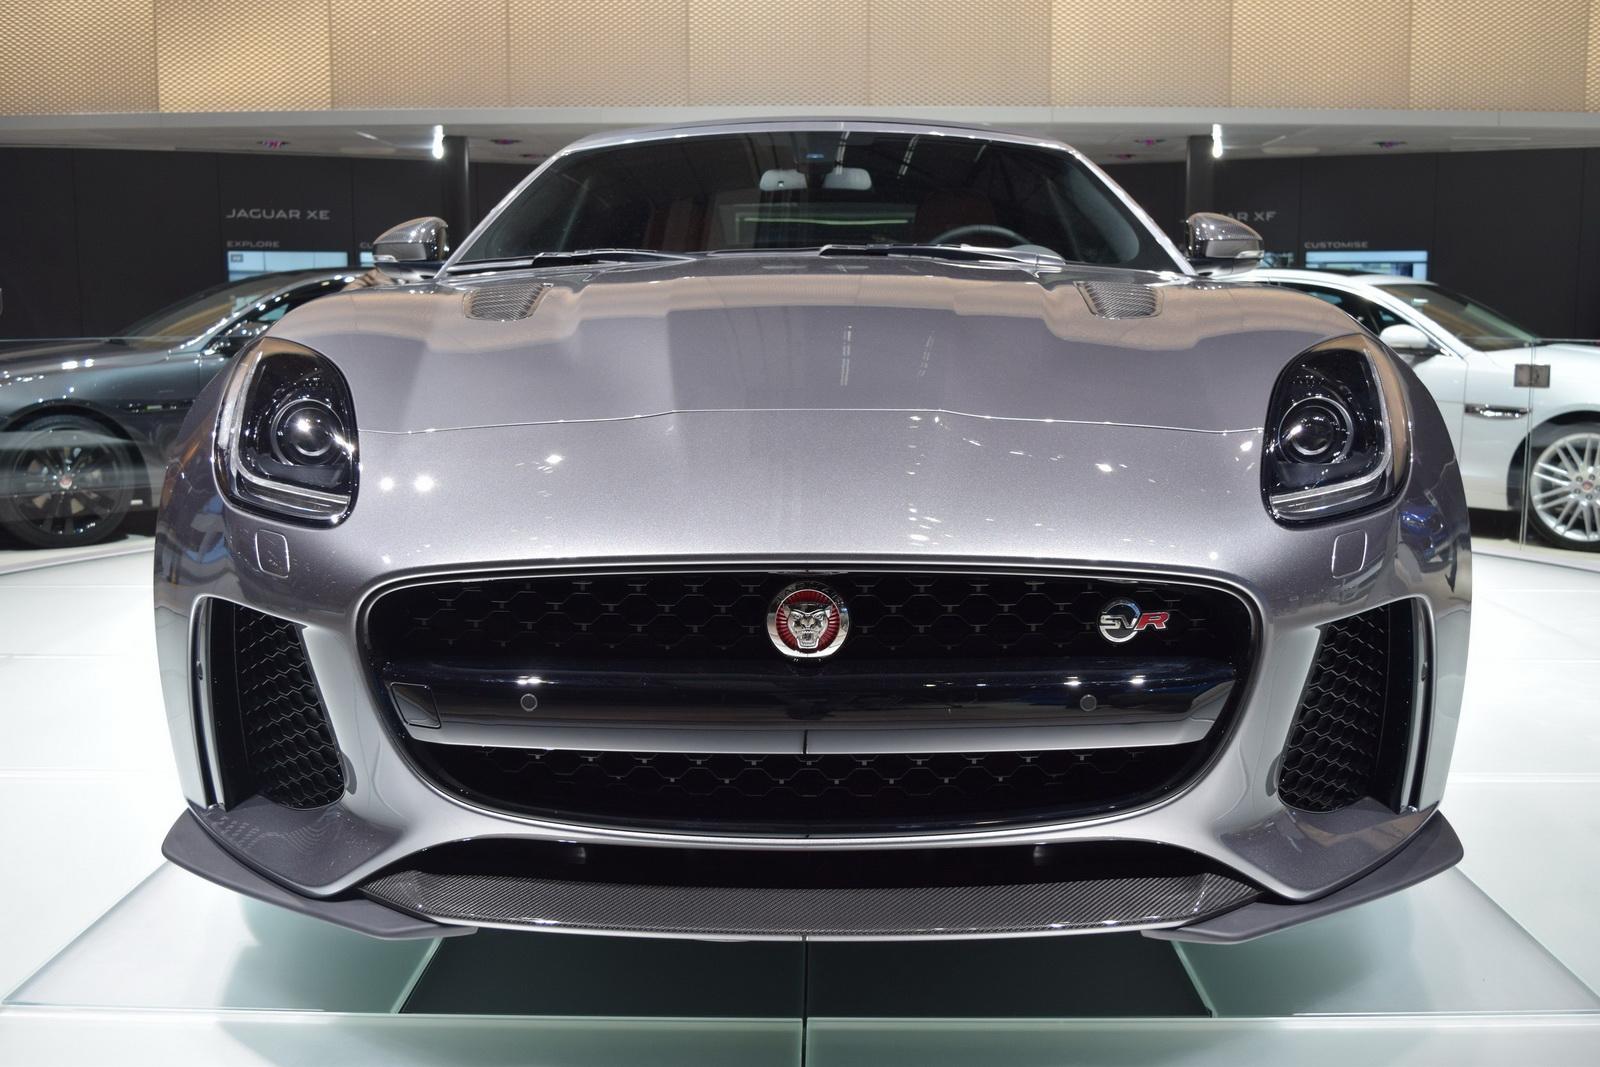 Jaguar F-Type SVR 2017 chính thức ra mắt tại Geneva Motor Show 2016